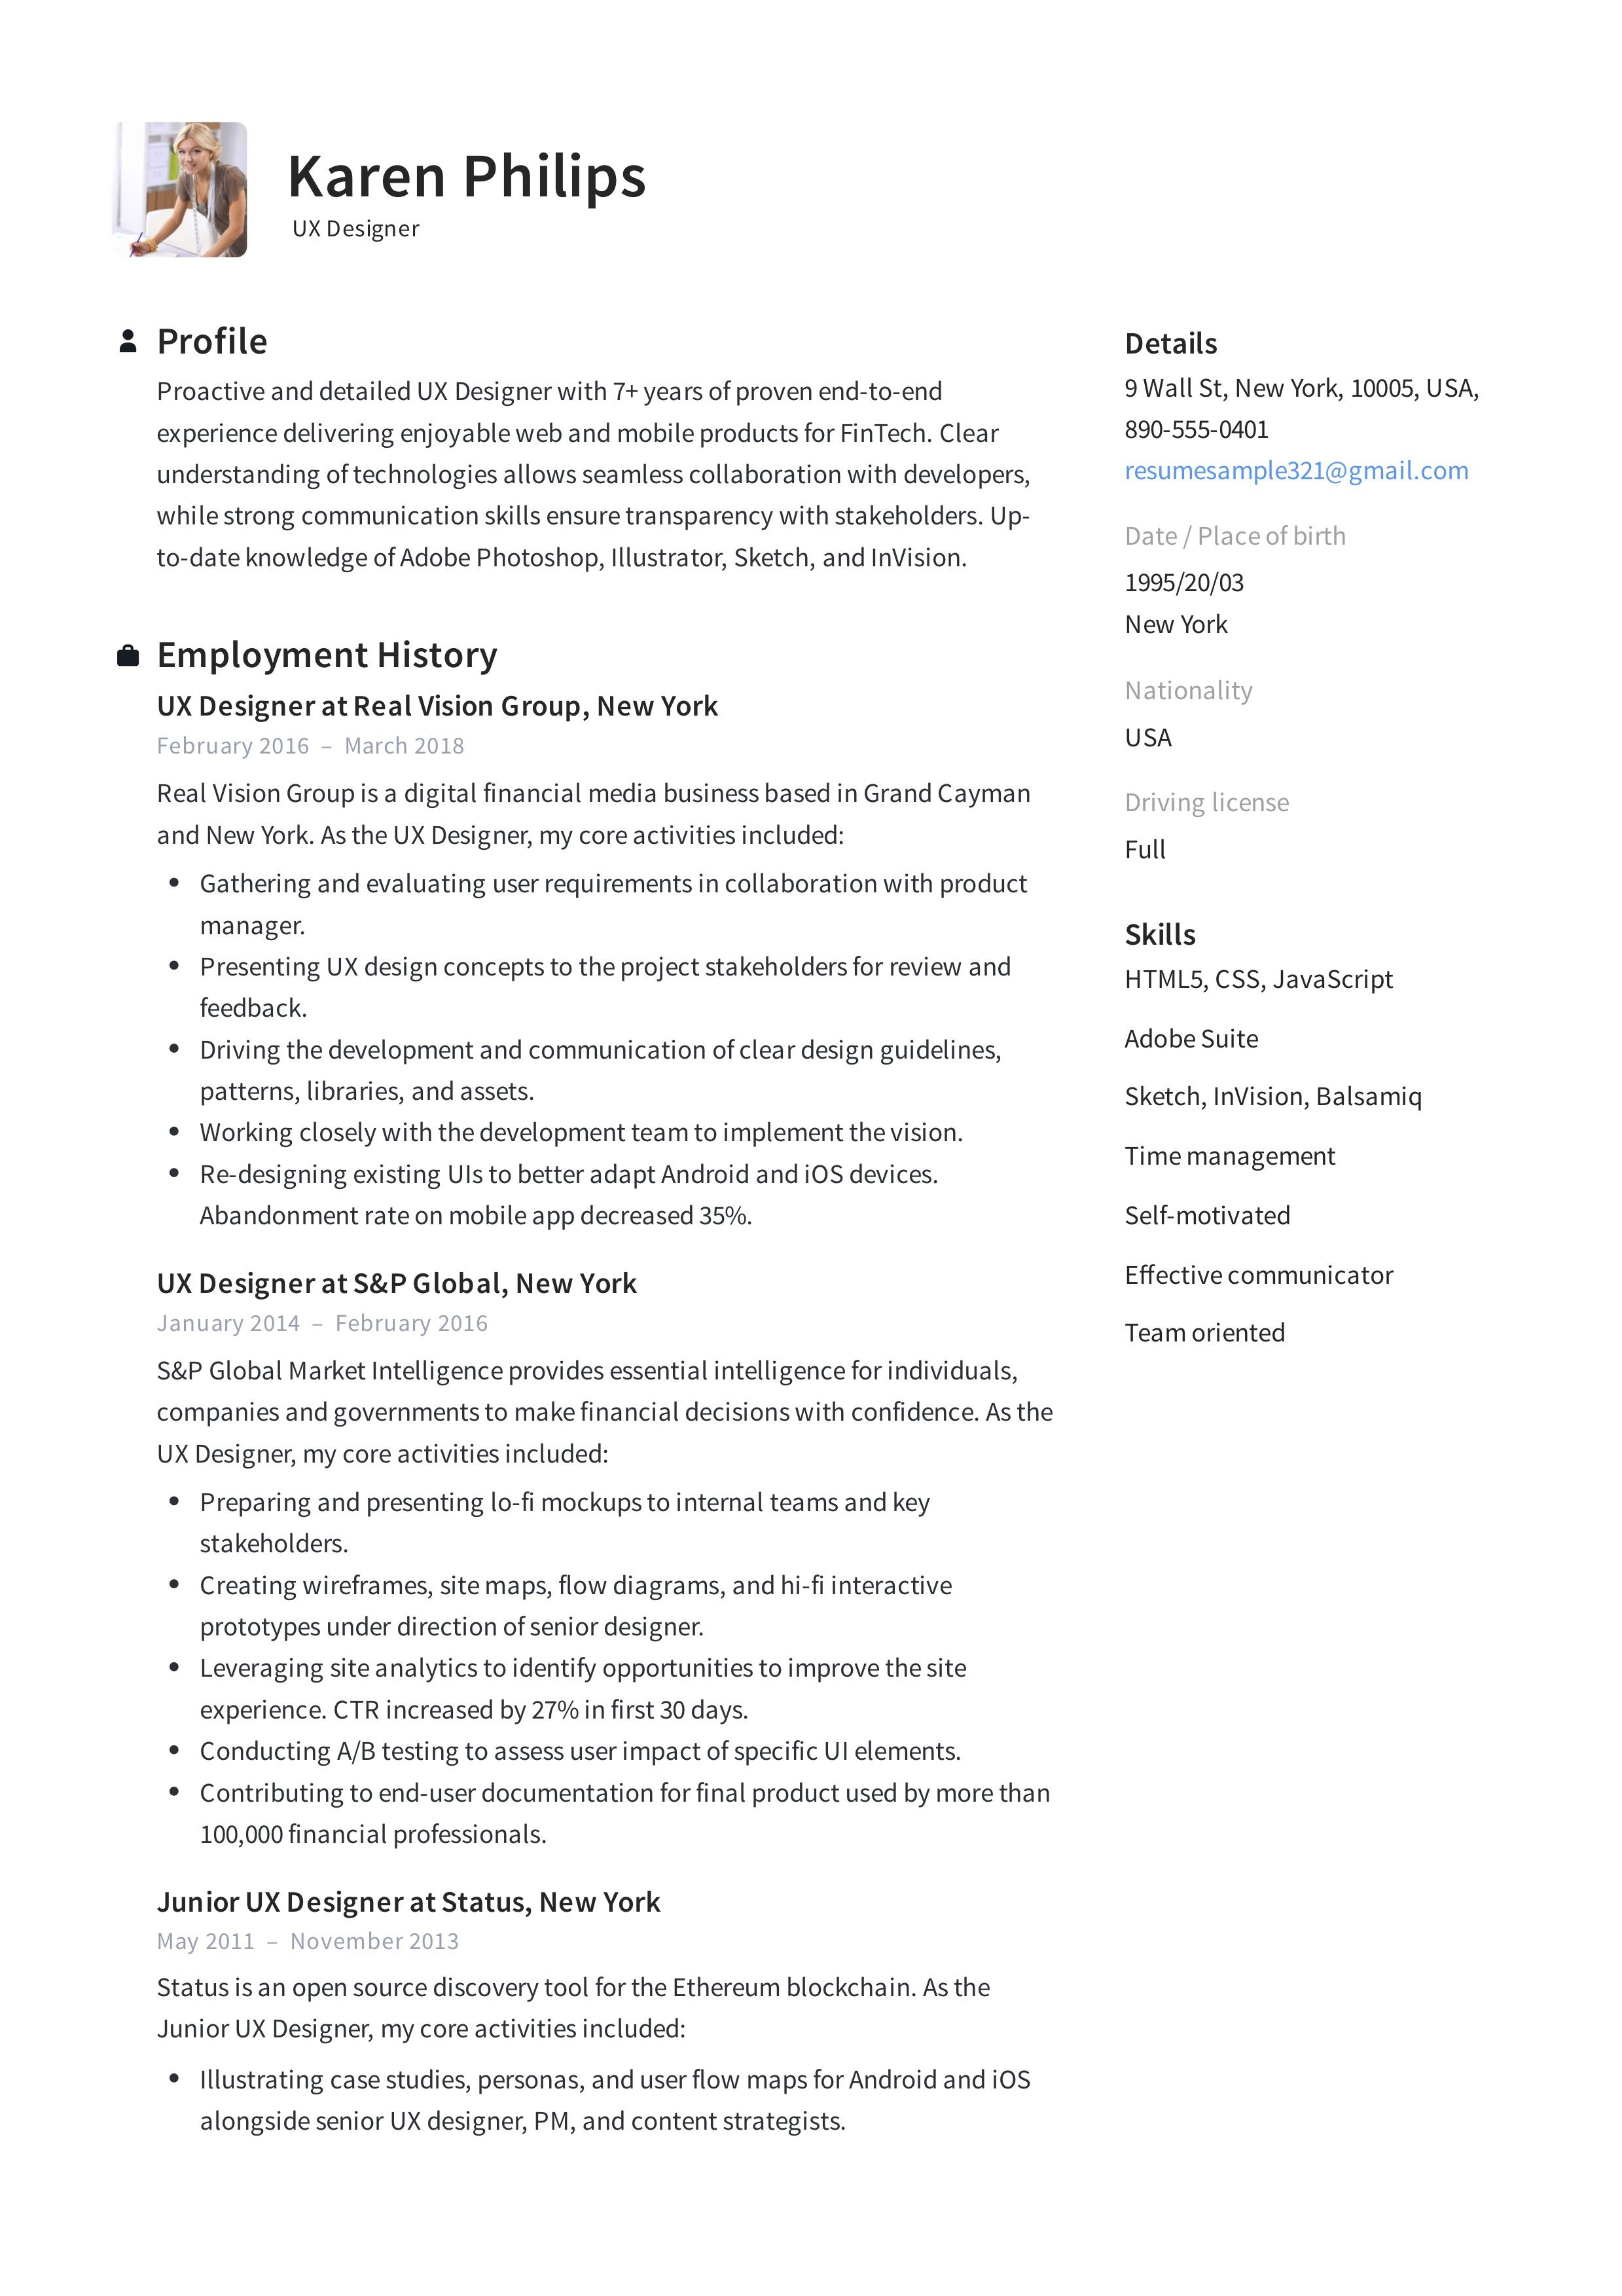 UX Designer Resume Example, Template, Sample, CV, Formal